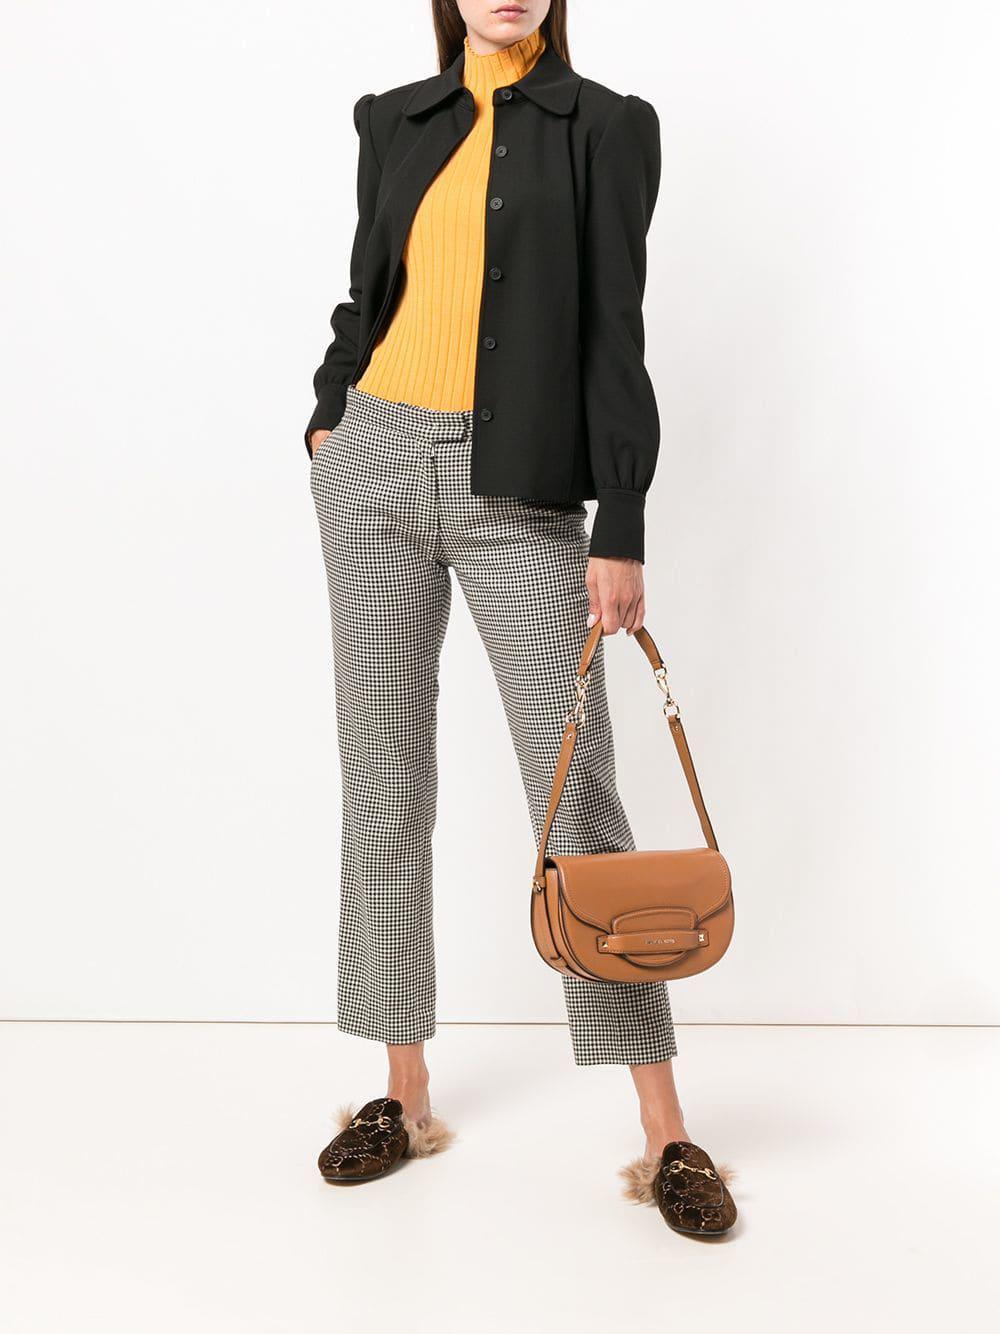 7103ba731850e5 MICHAEL Michael Kors Cary Saddle Bag in Brown - Save 71% - Lyst